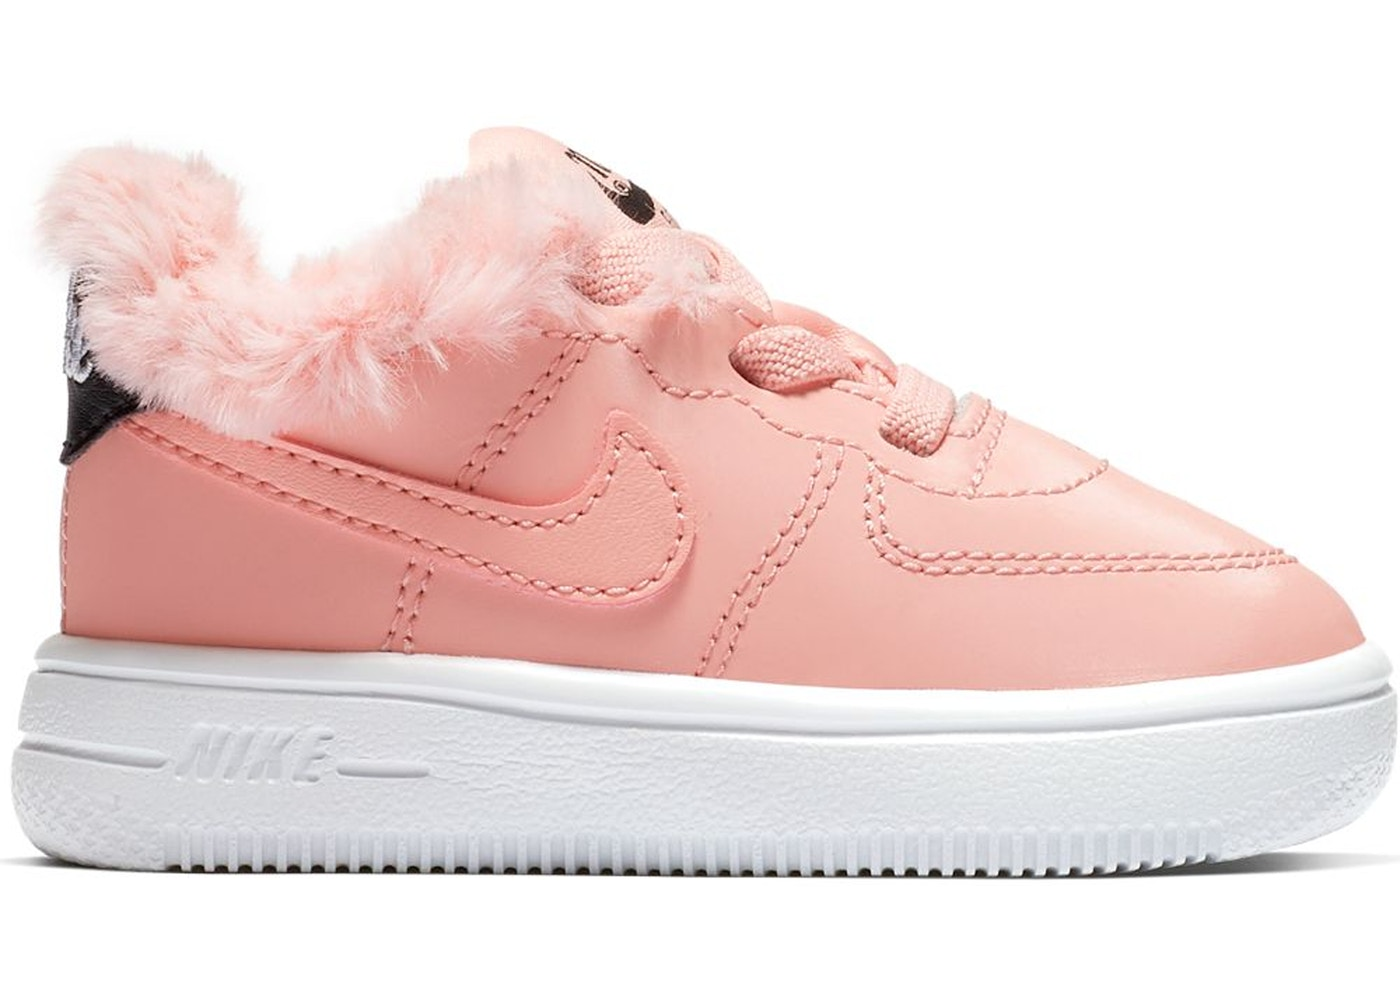 4952b1d0402f Nike Air Force Shoes - New Highest Bids